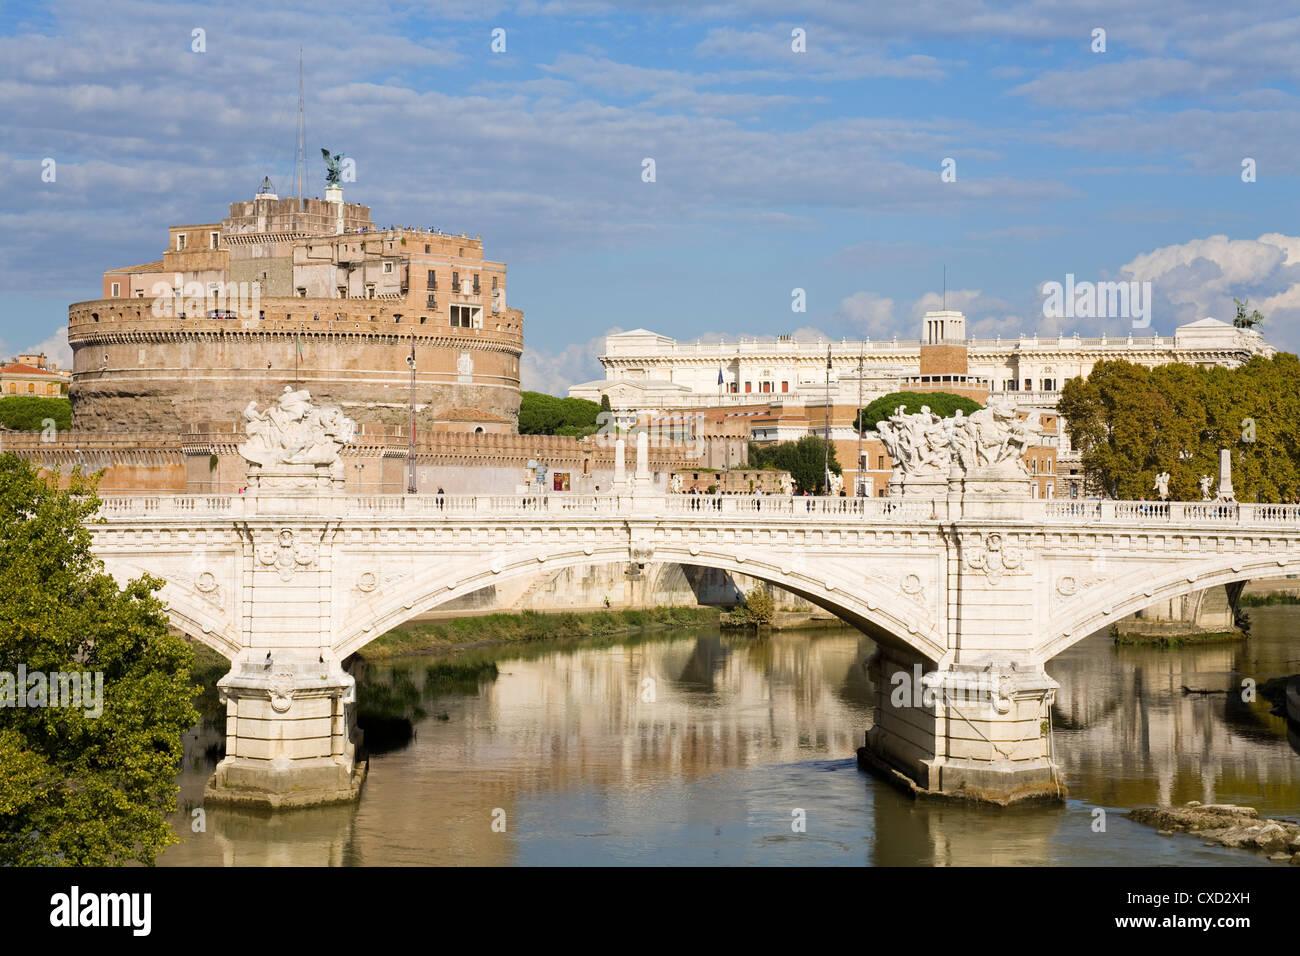 Vittorio Emanuelle bridge and St. Angelo Castle and National Museum, Rome, Lazio, Italy, Europe - Stock Image